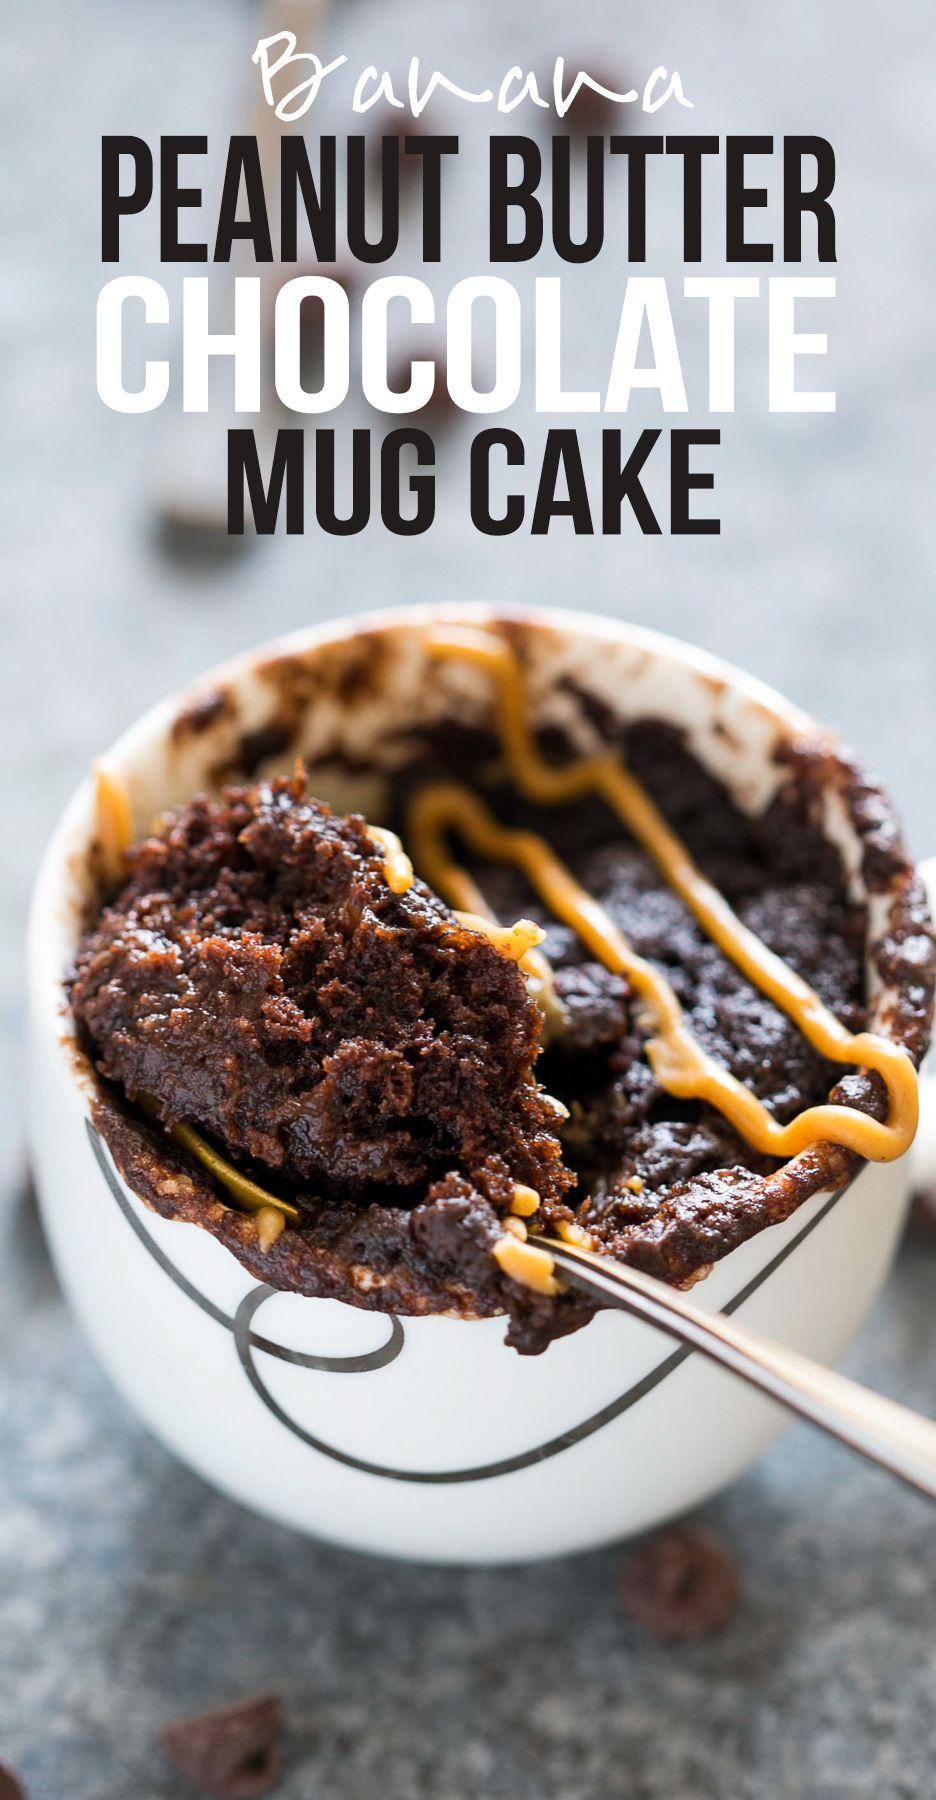 Eggless Banana Chocolate Peanut Butter Mug Cake | Recipe ...